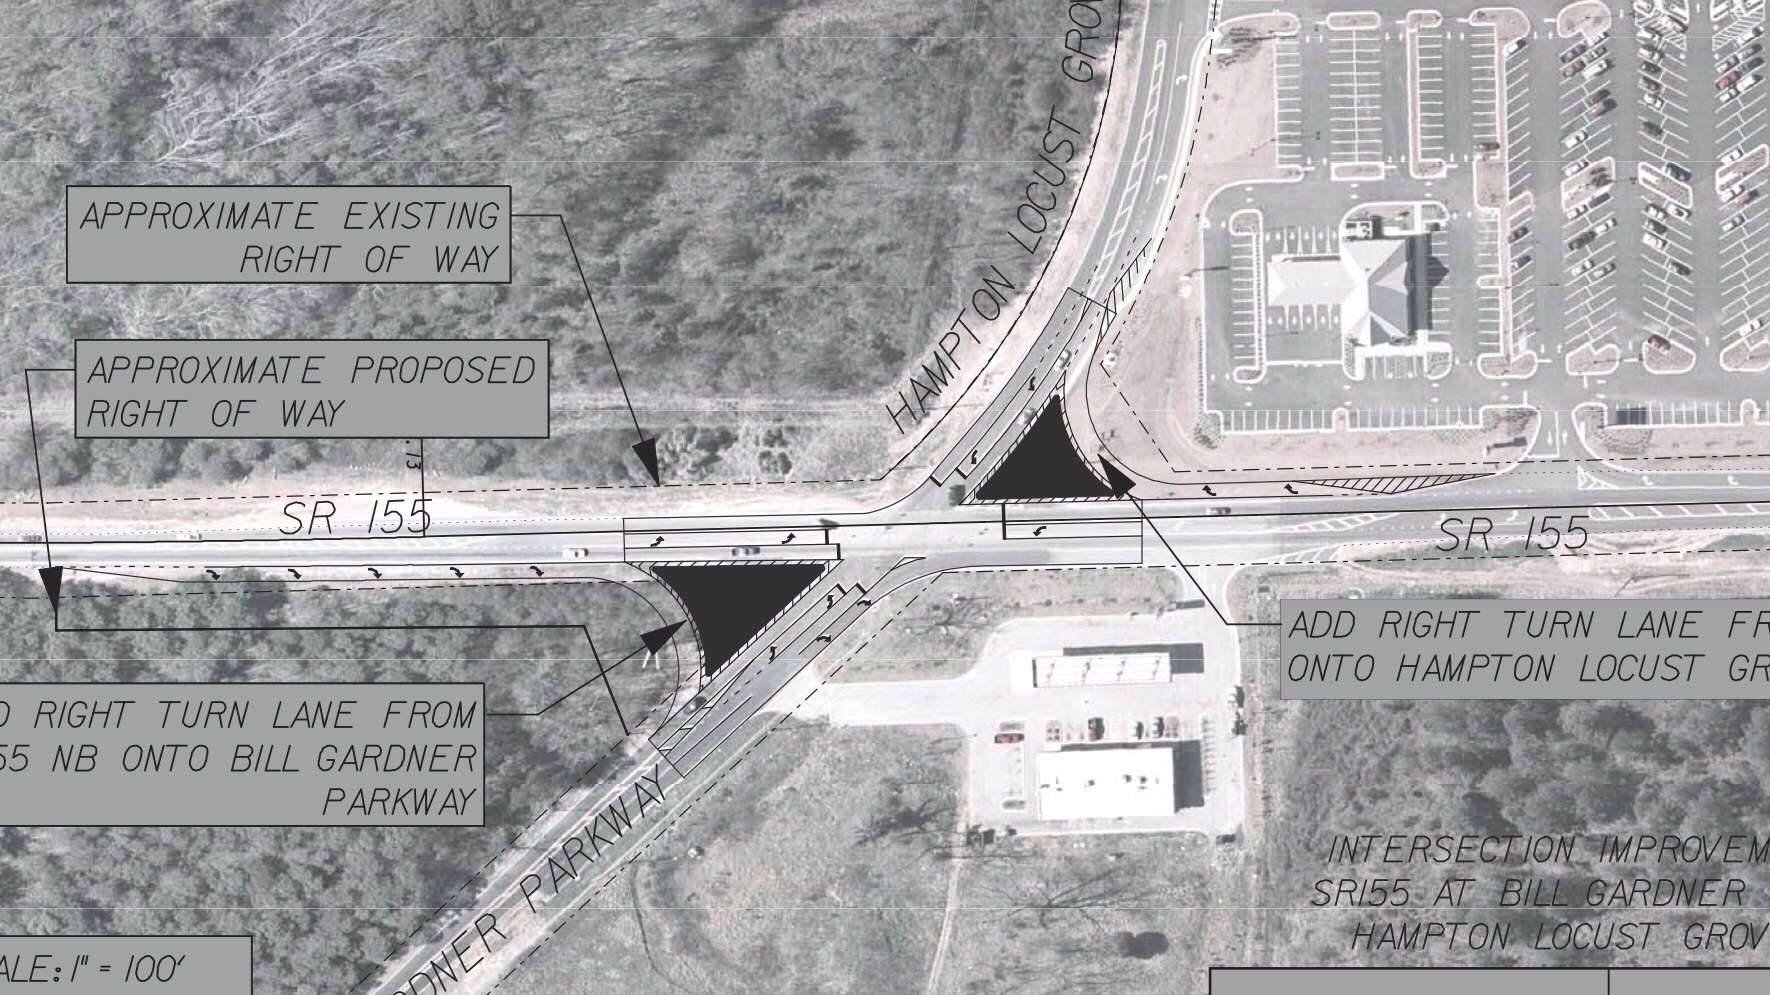 SR 155 at Bill Gardner Parkway safety improvements